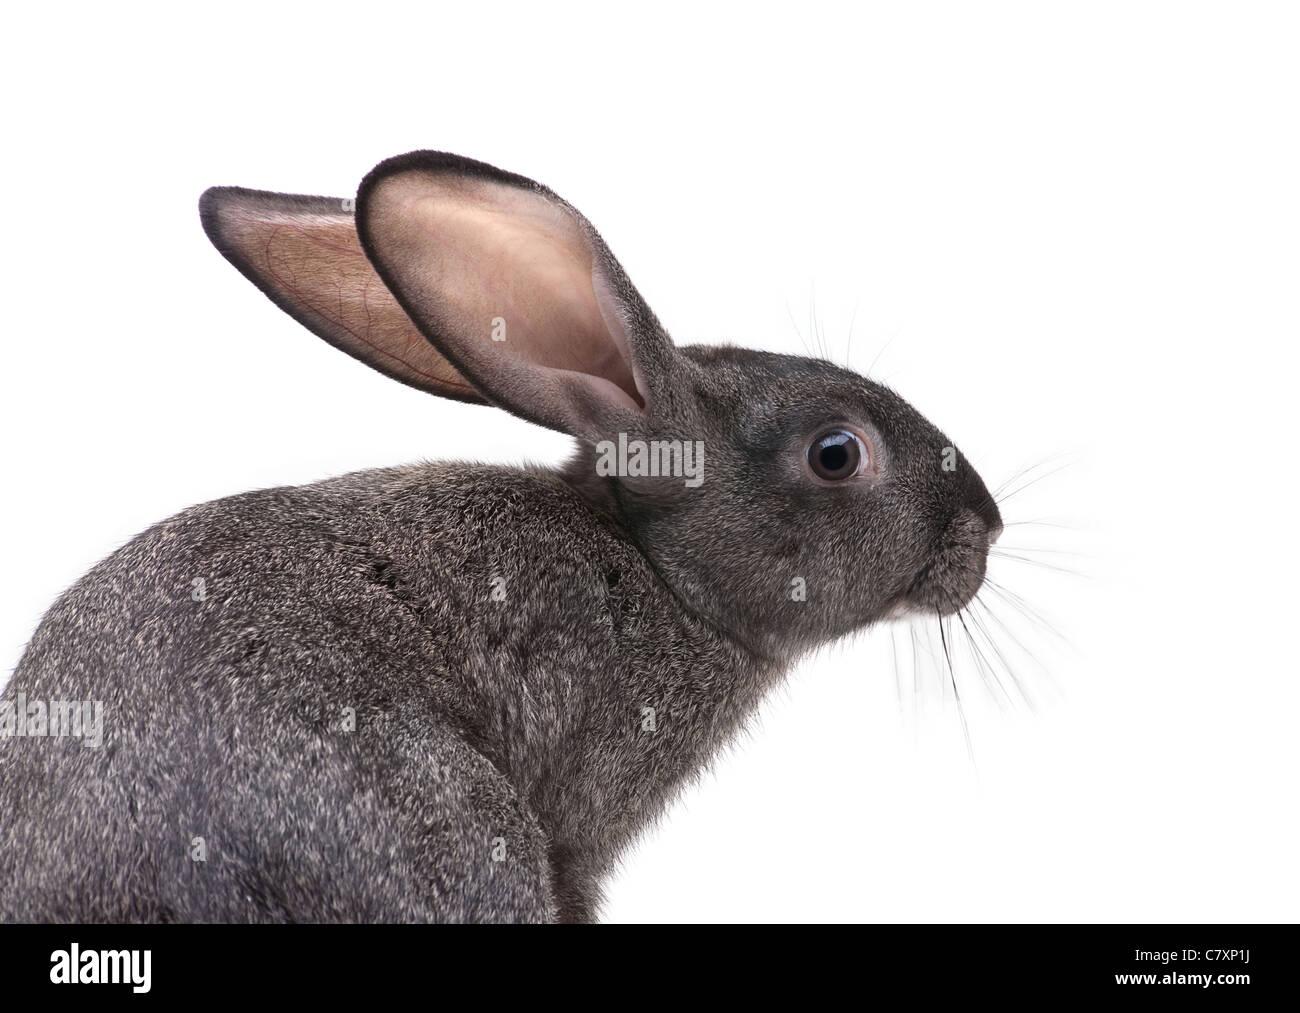 Rabbit farm animal closeup on white background - Stock Image